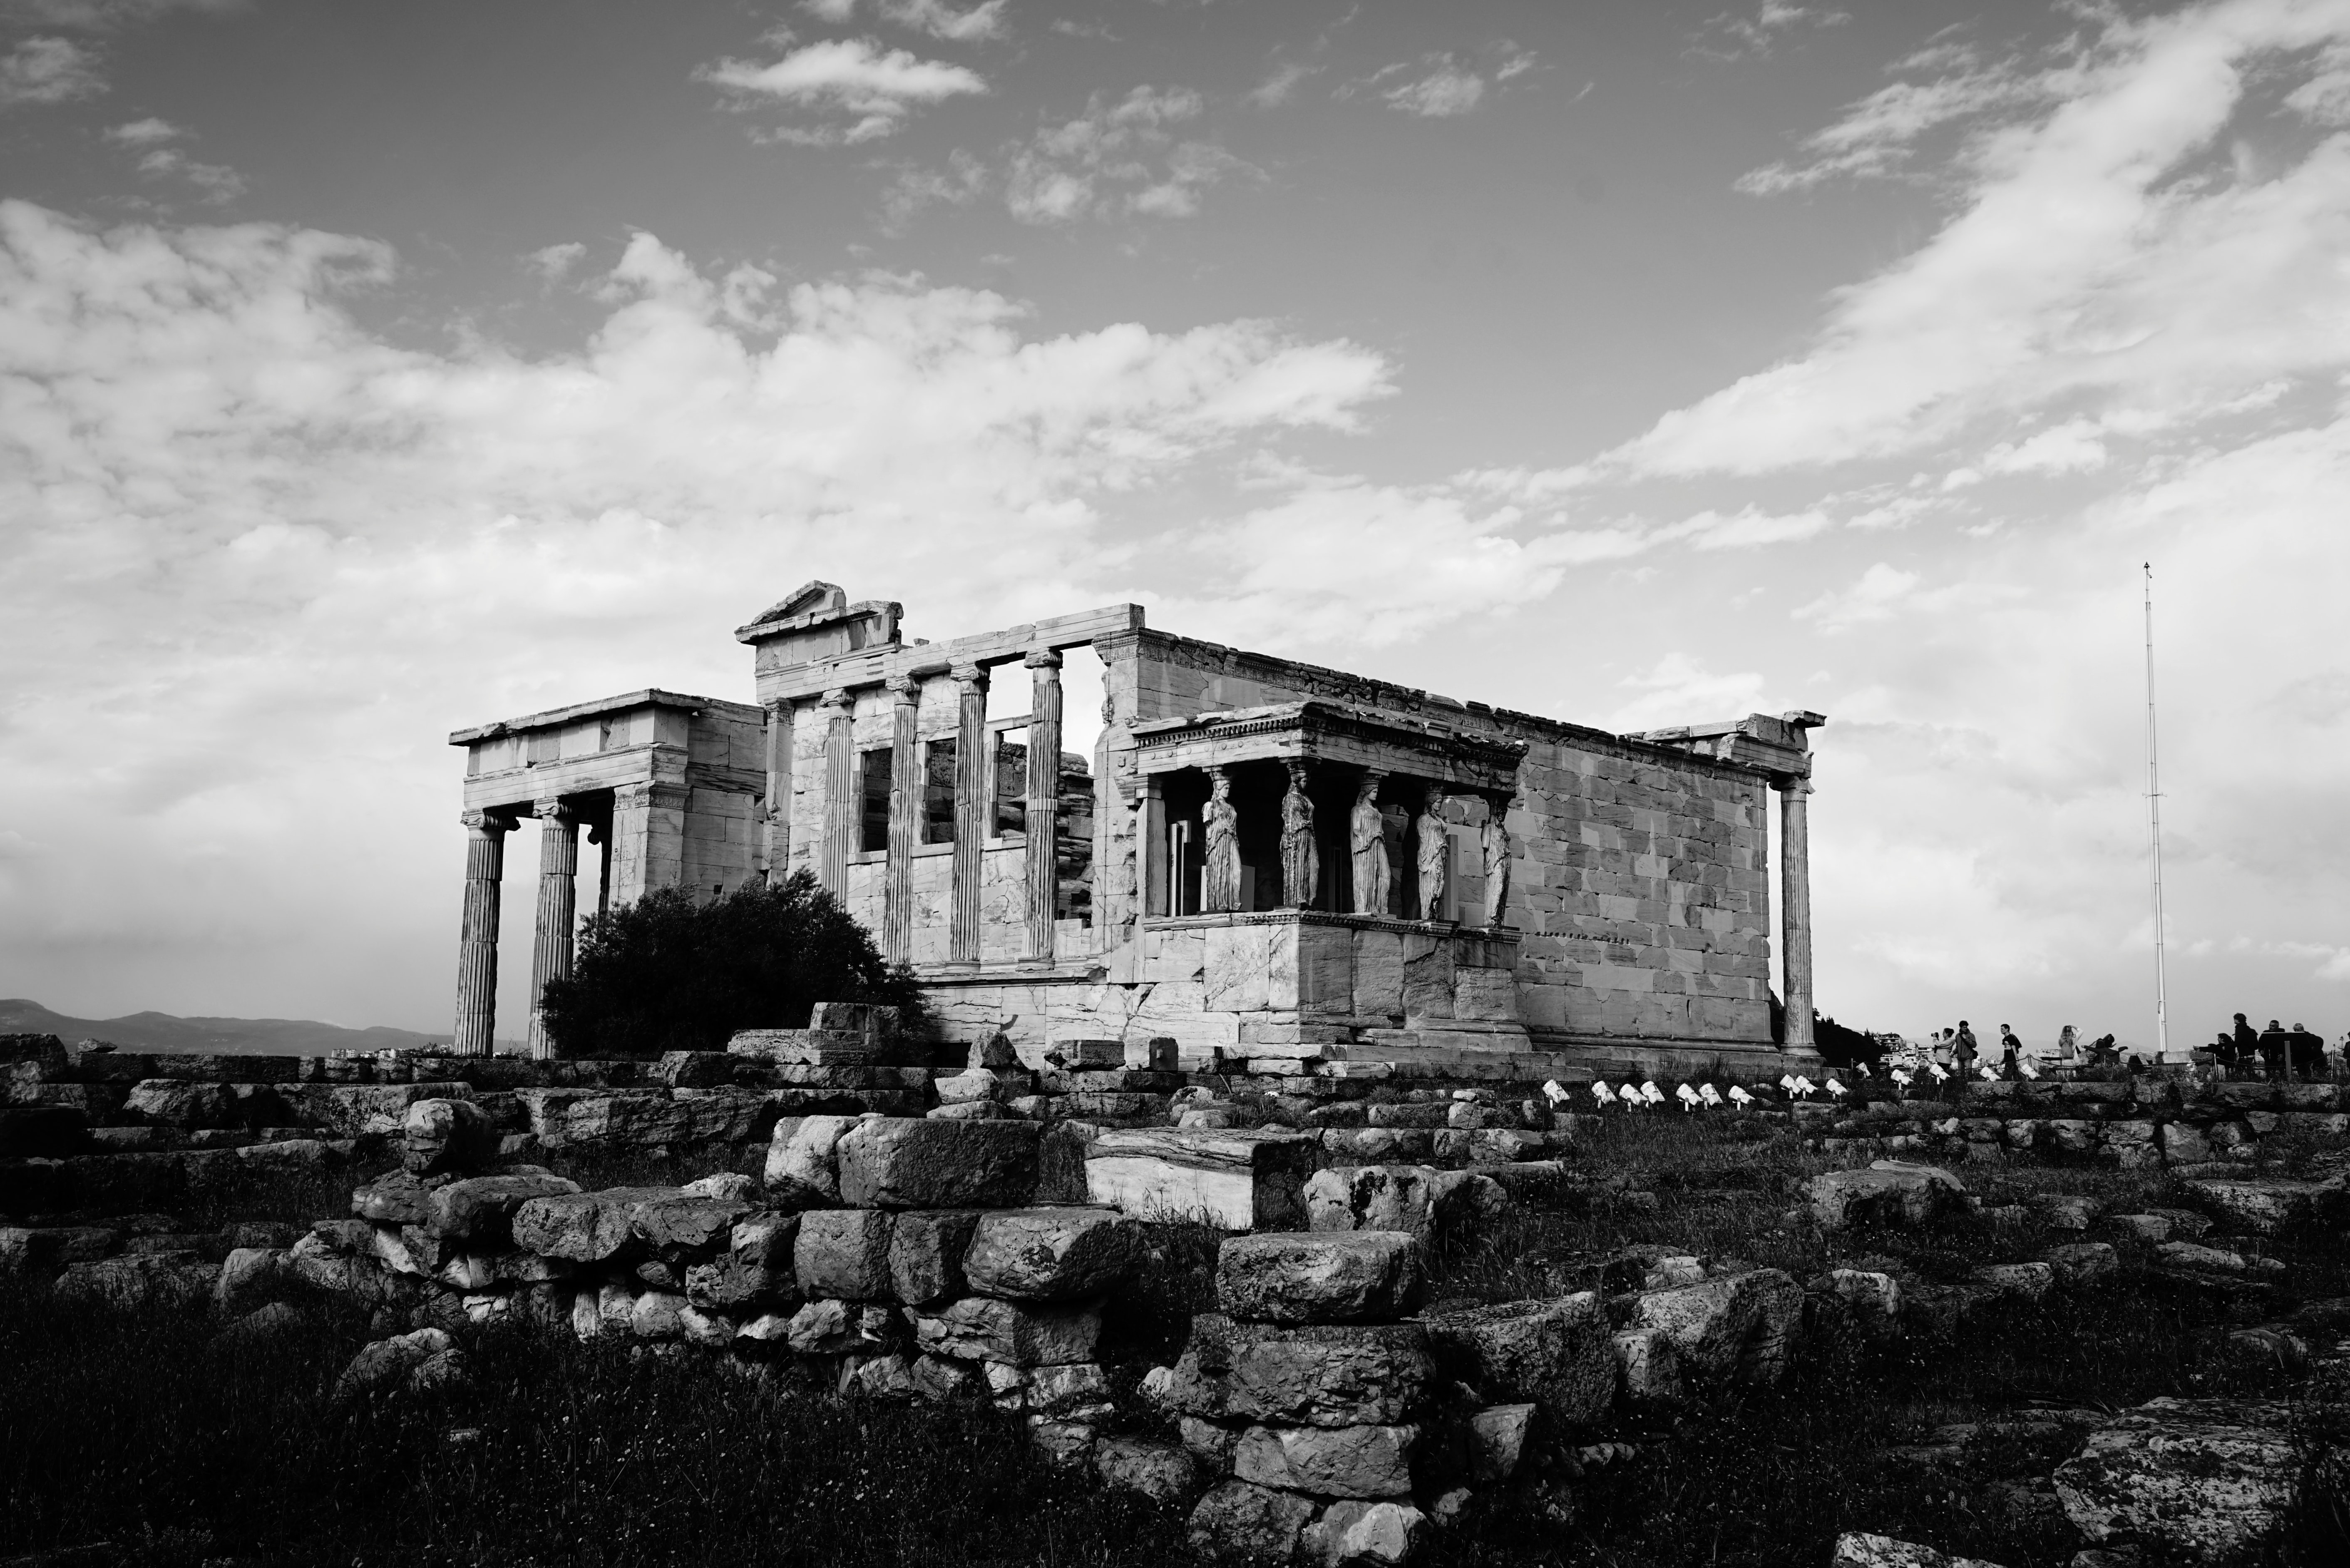 greyscale photo of ruins